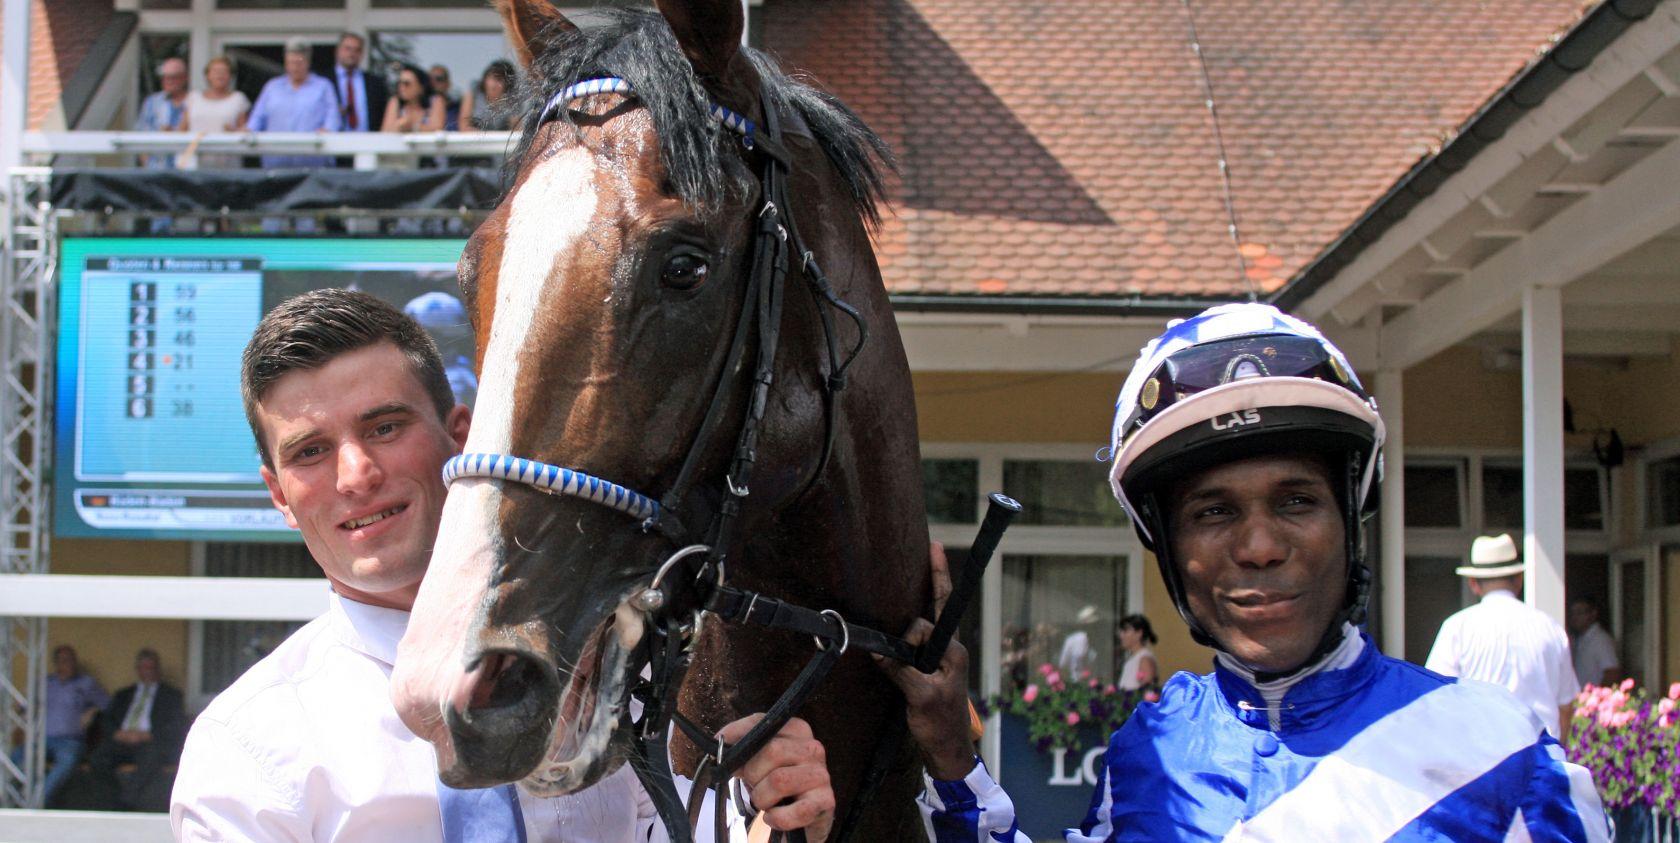 Royal Youmzain mit Eduardo Pedroza nach dem Sieg im Ittlingen Derby Trial Copyright: Sorge/Galoppfoto.de